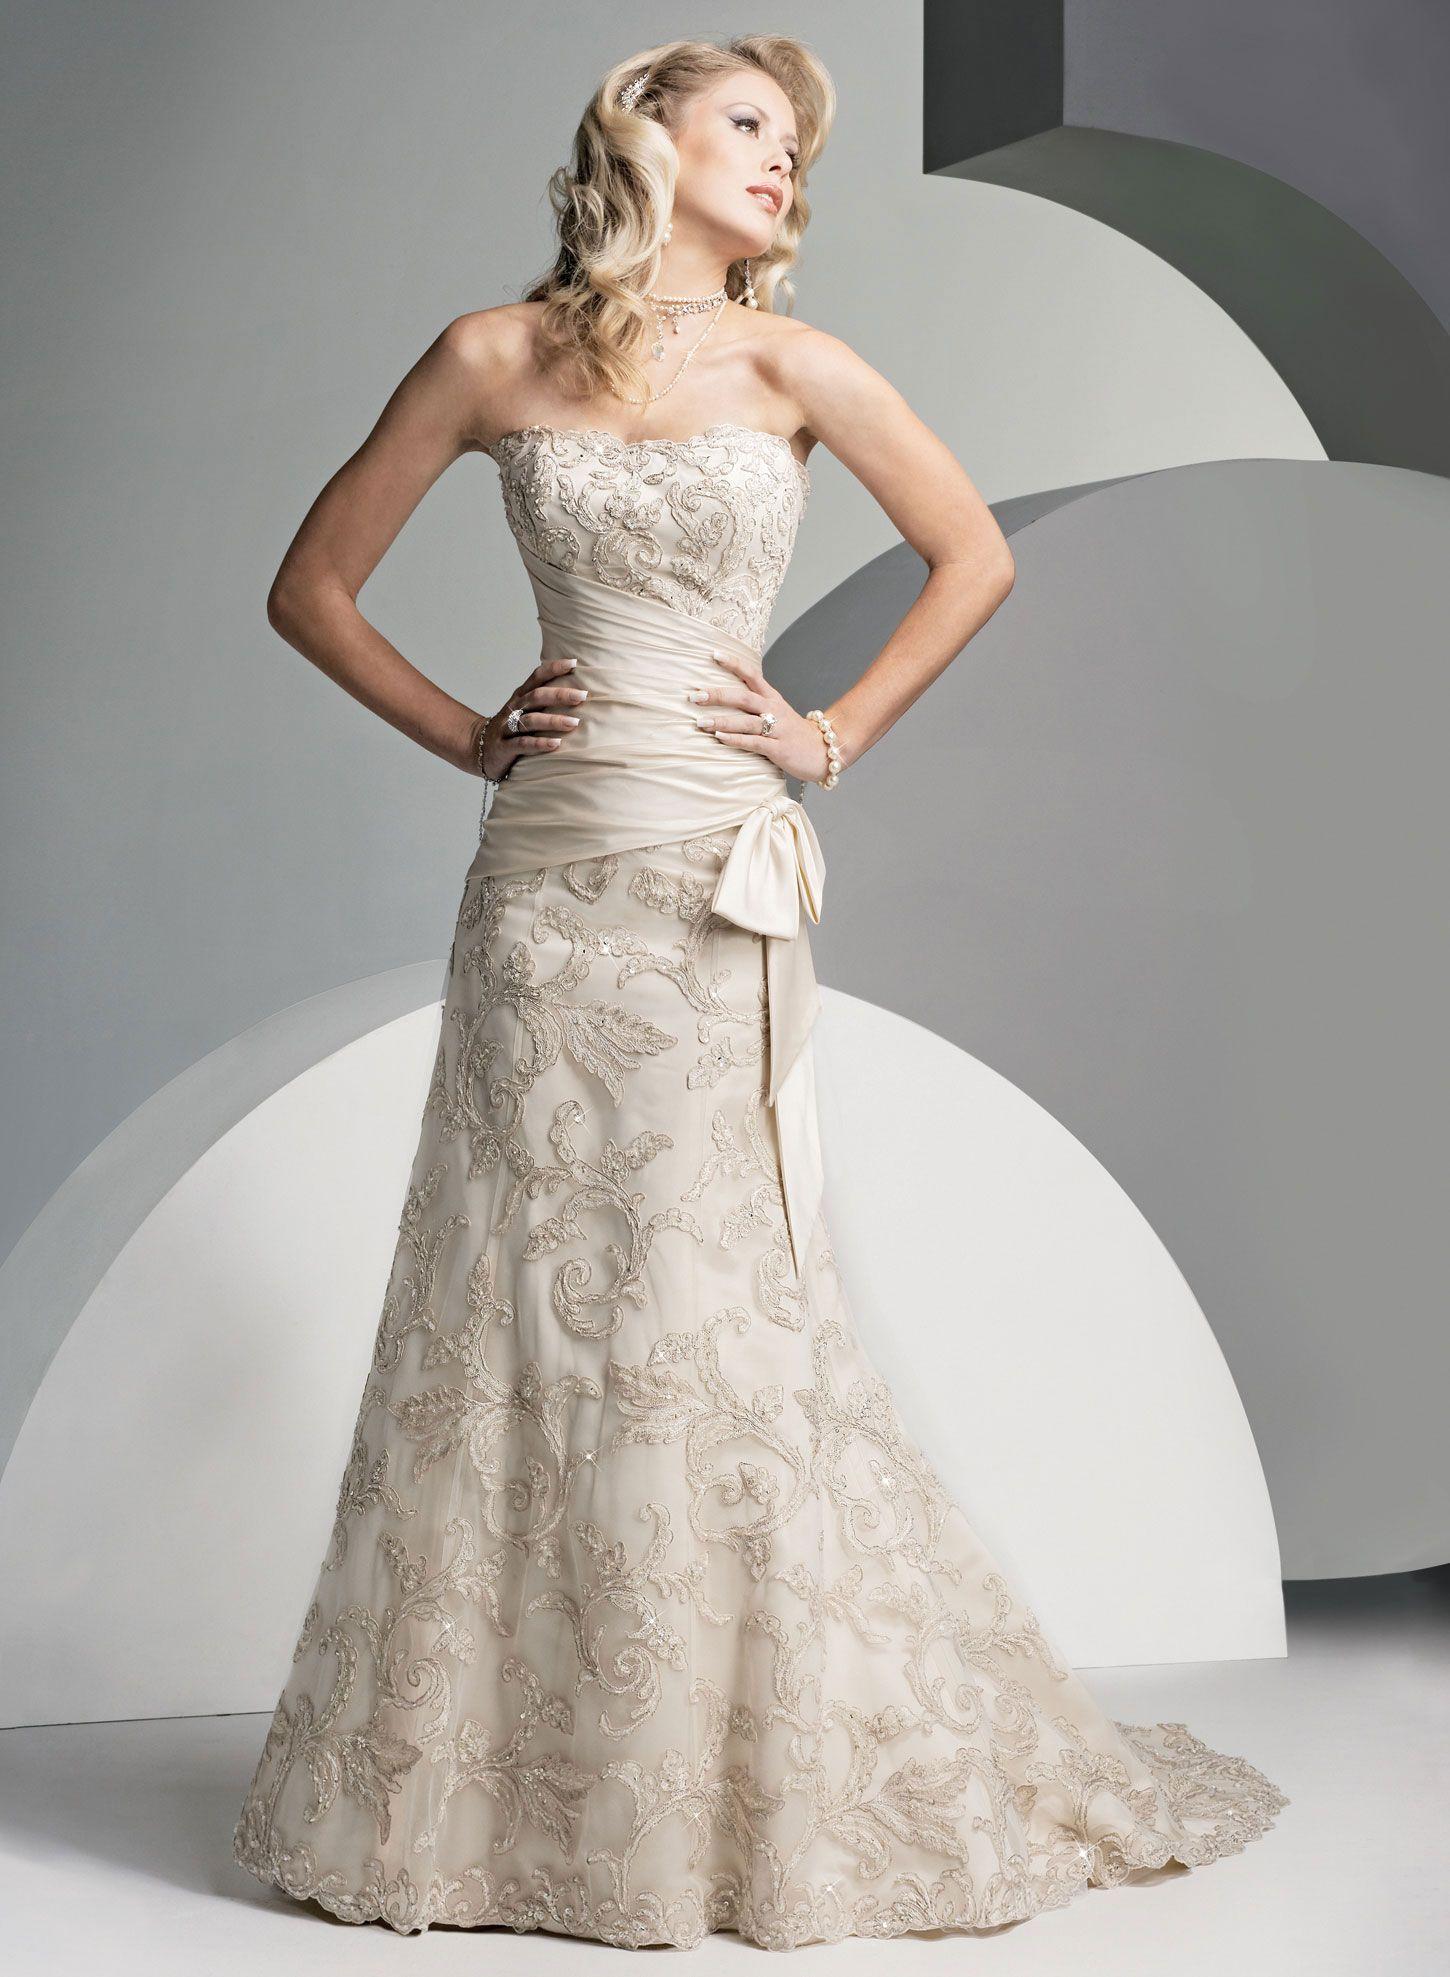 30 Vintage Wedding Dresses Bride Style Strapless Dressesmaggie Sottero